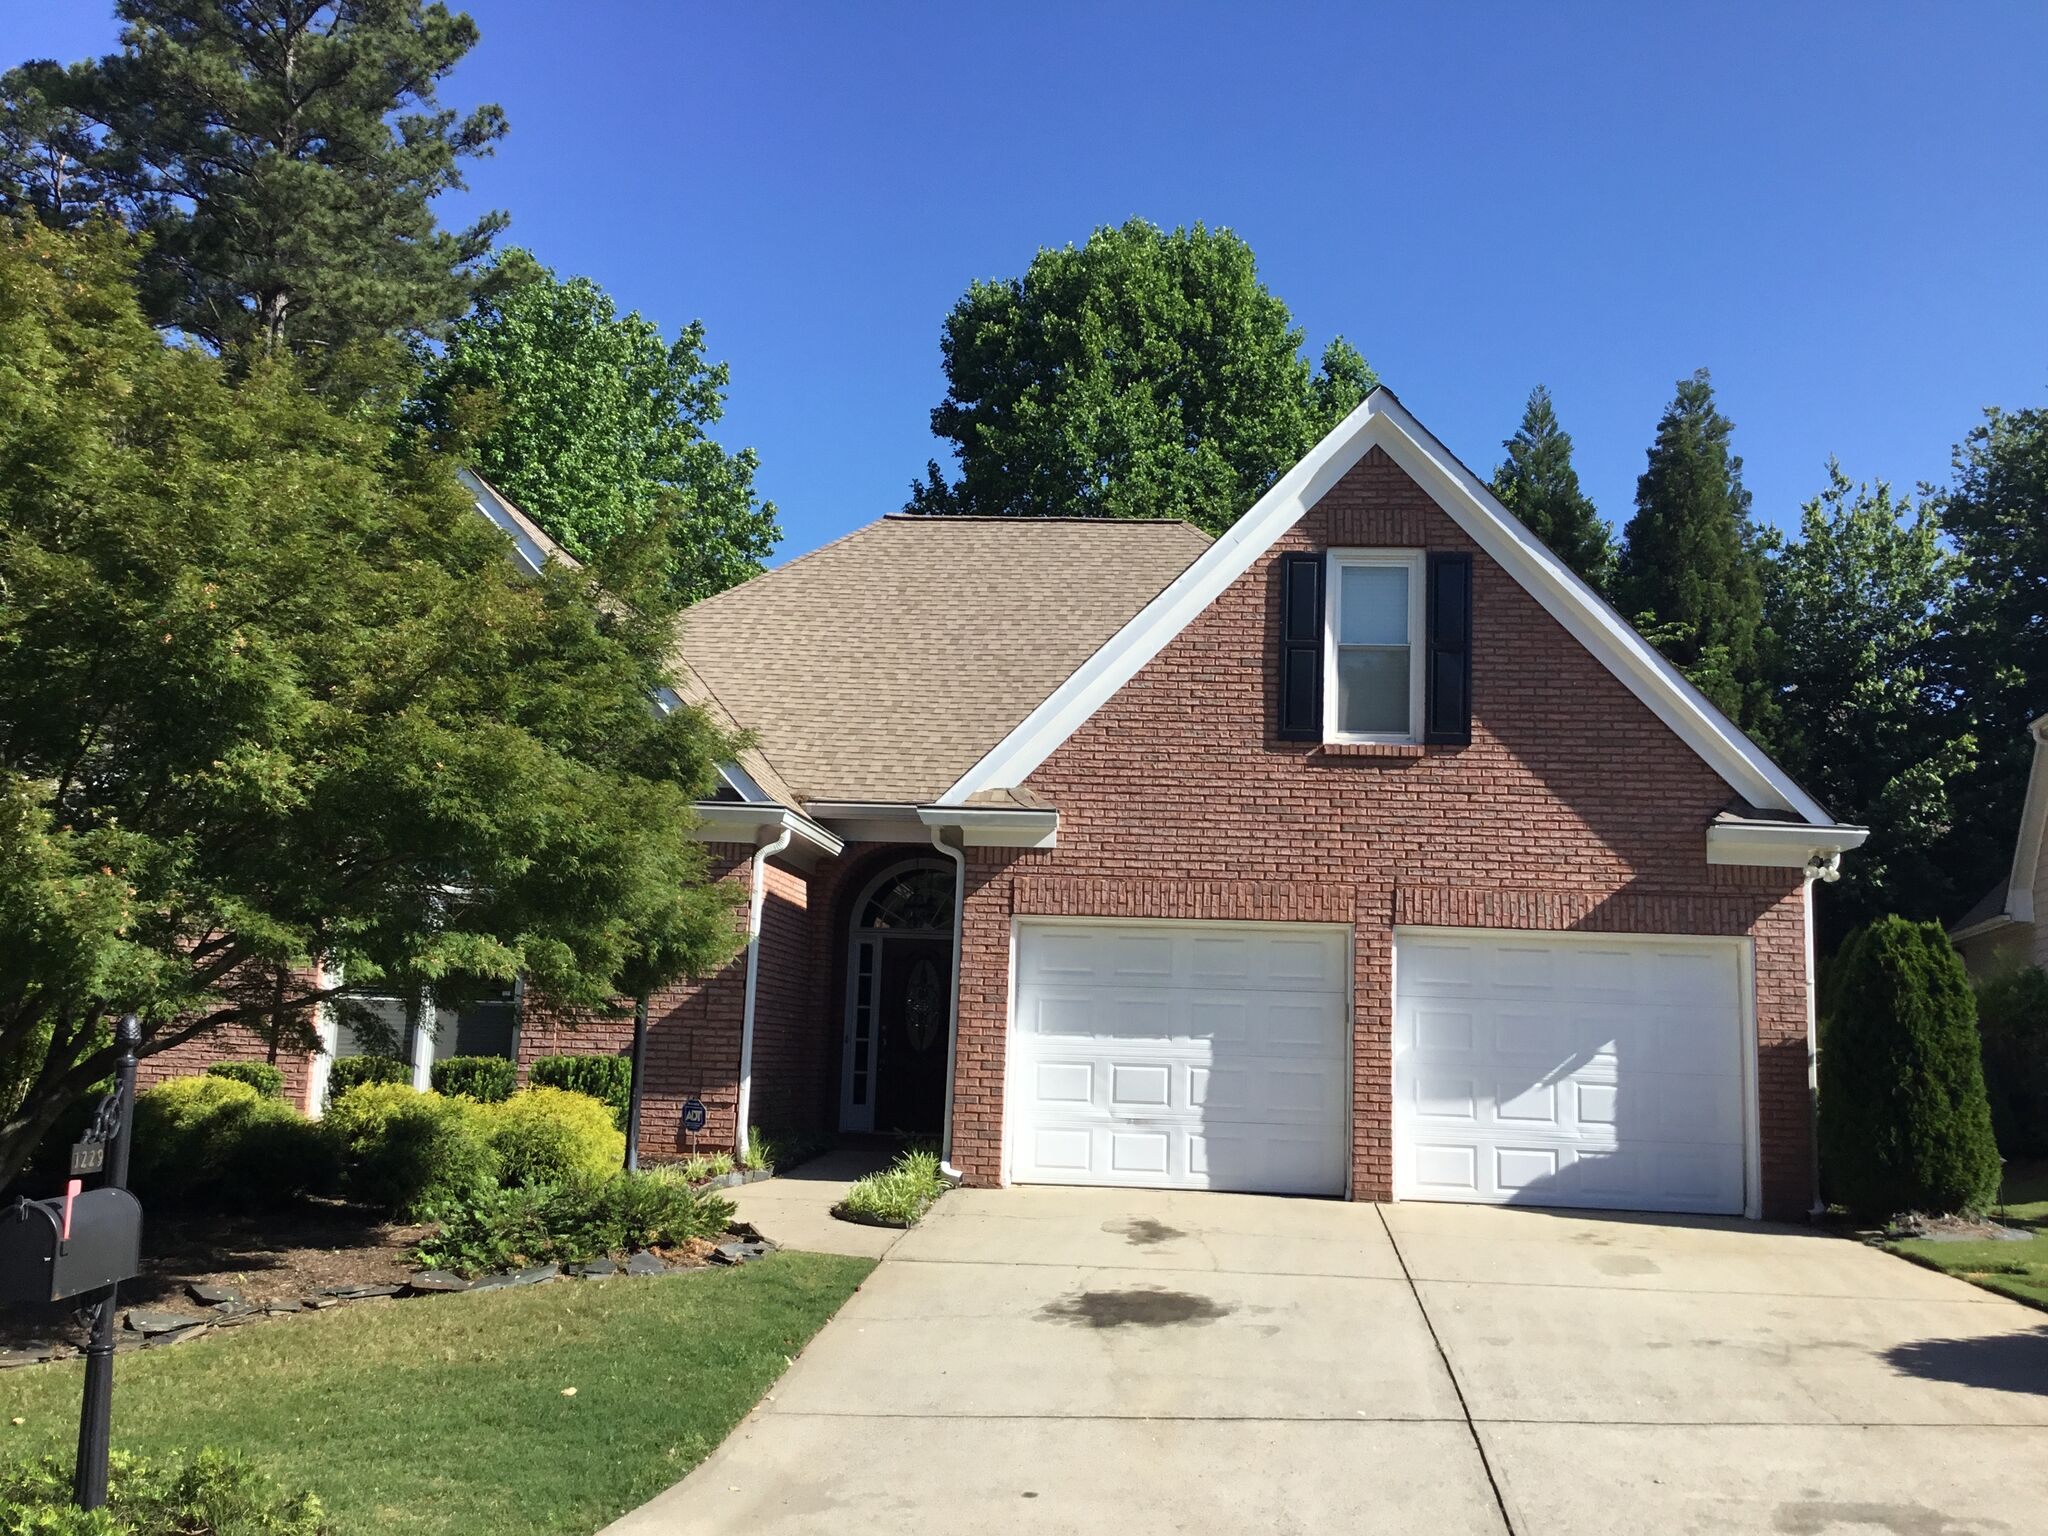 Photo of 1229 Parkview Lane NW, Kennesaw, GA, 30152